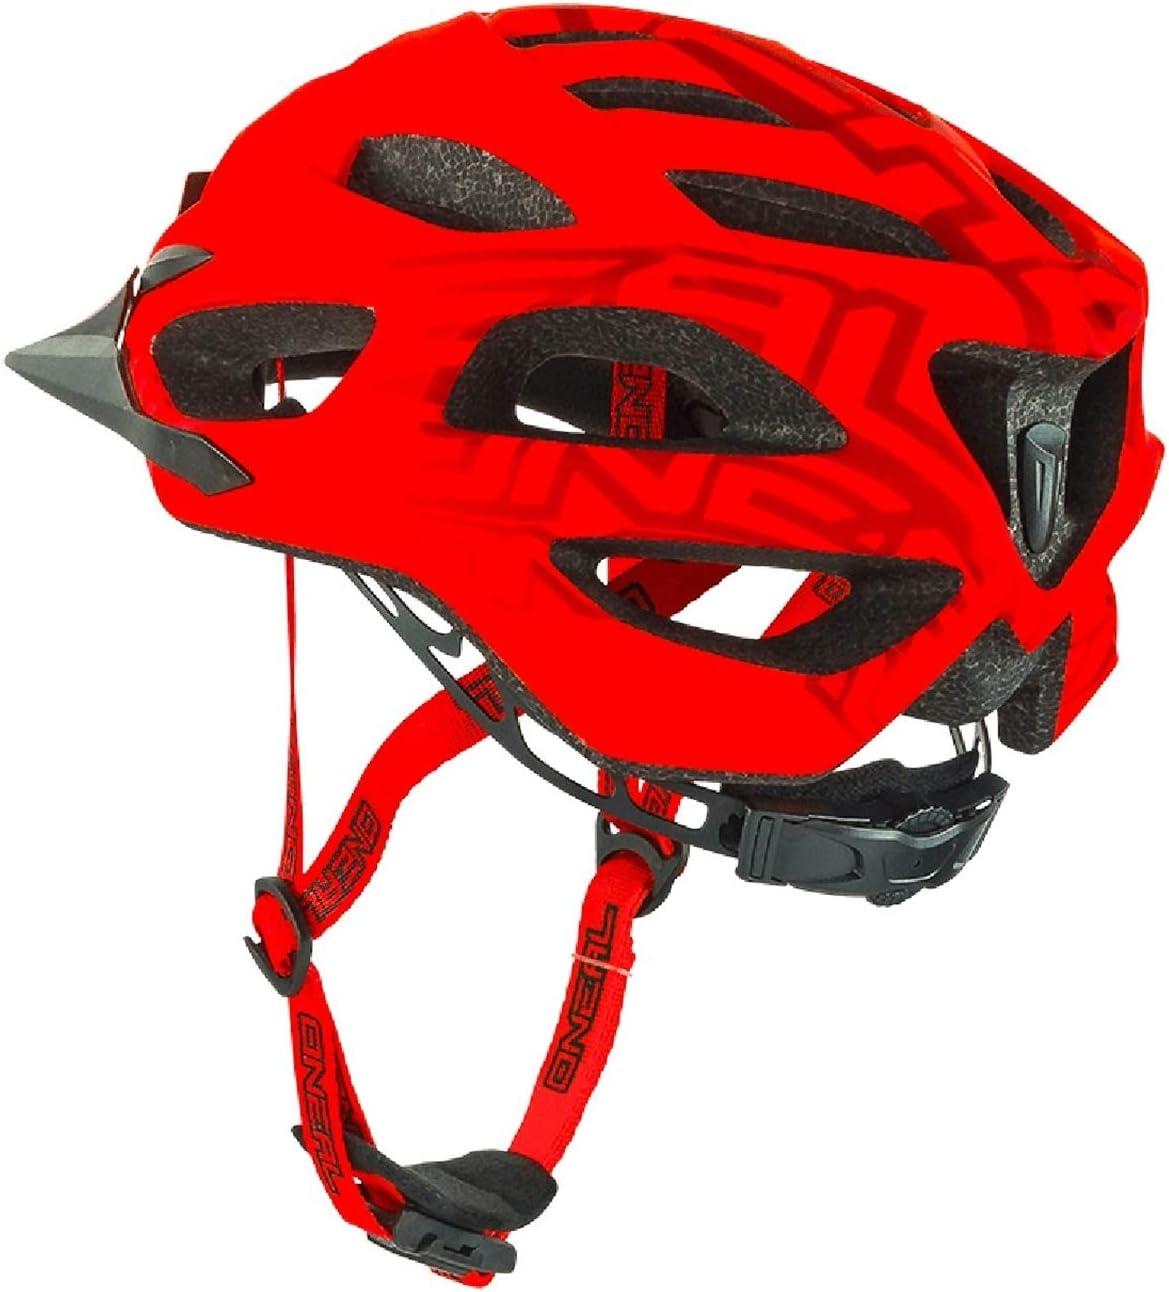 0504/ /10 O Neal Q RL semigusci Casco MTB Rosso all Mountain Enduro Trail Bicicletta